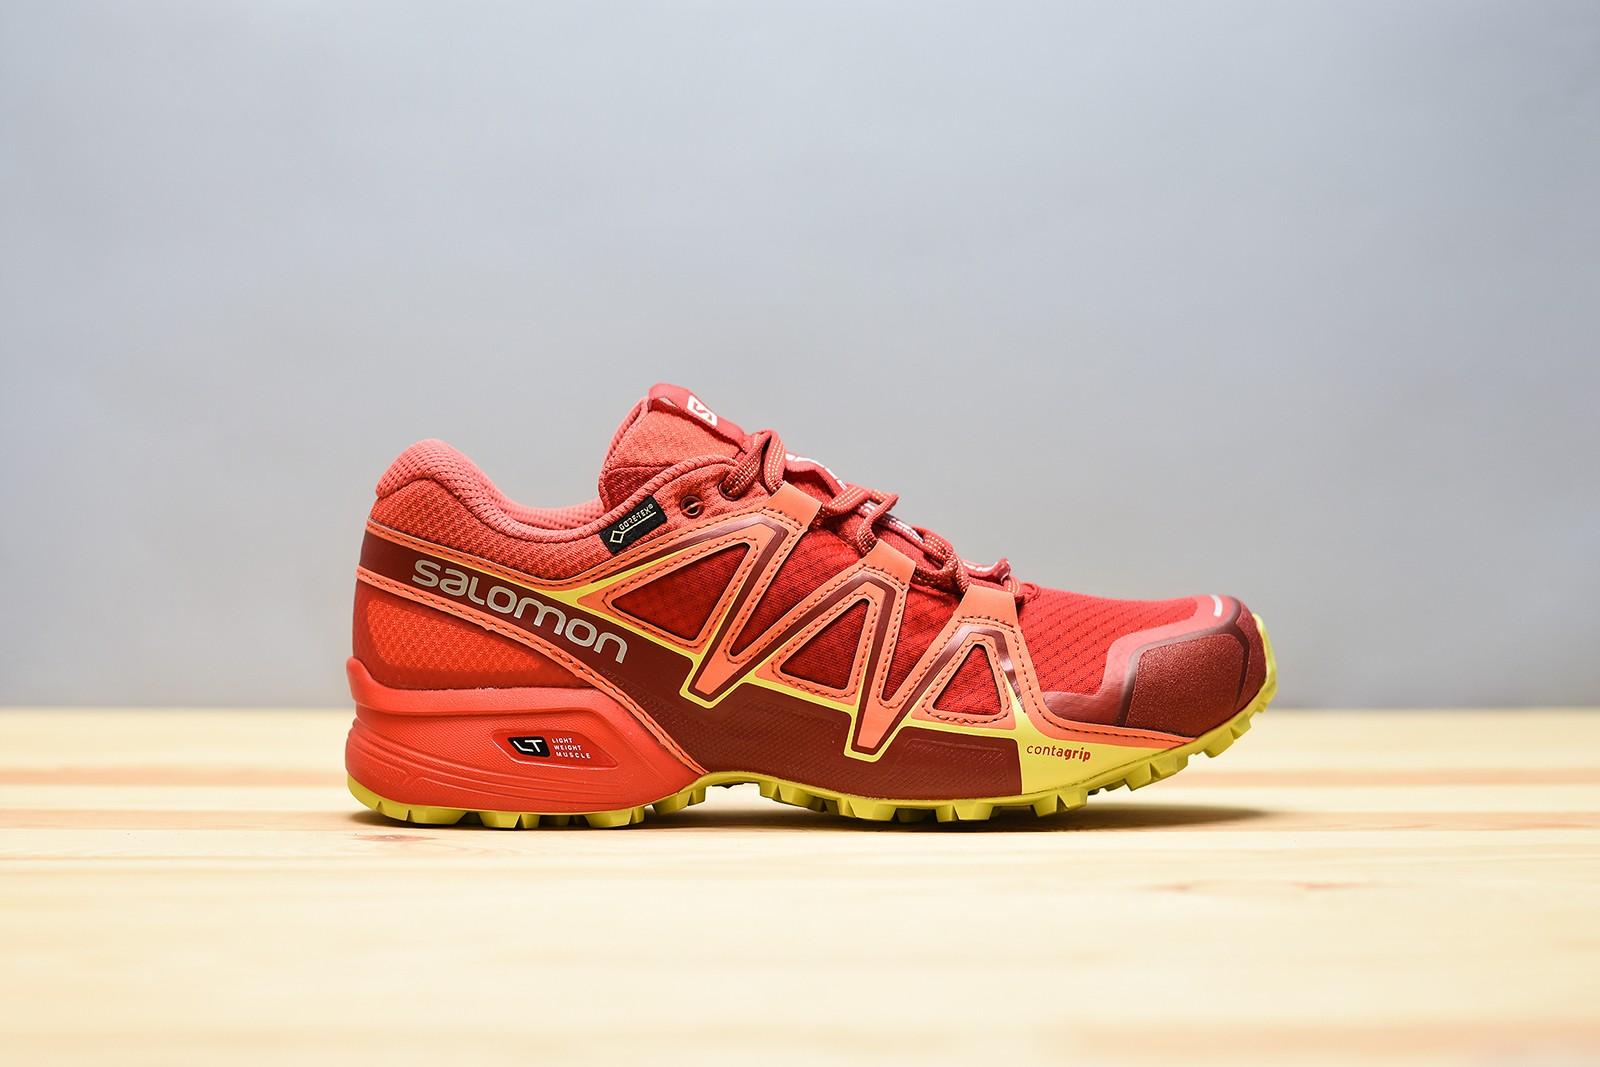 Dámské Běžecké boty Salomon SPEEDCROSS VARIO 2 GTXR W Barb  e7b7182726